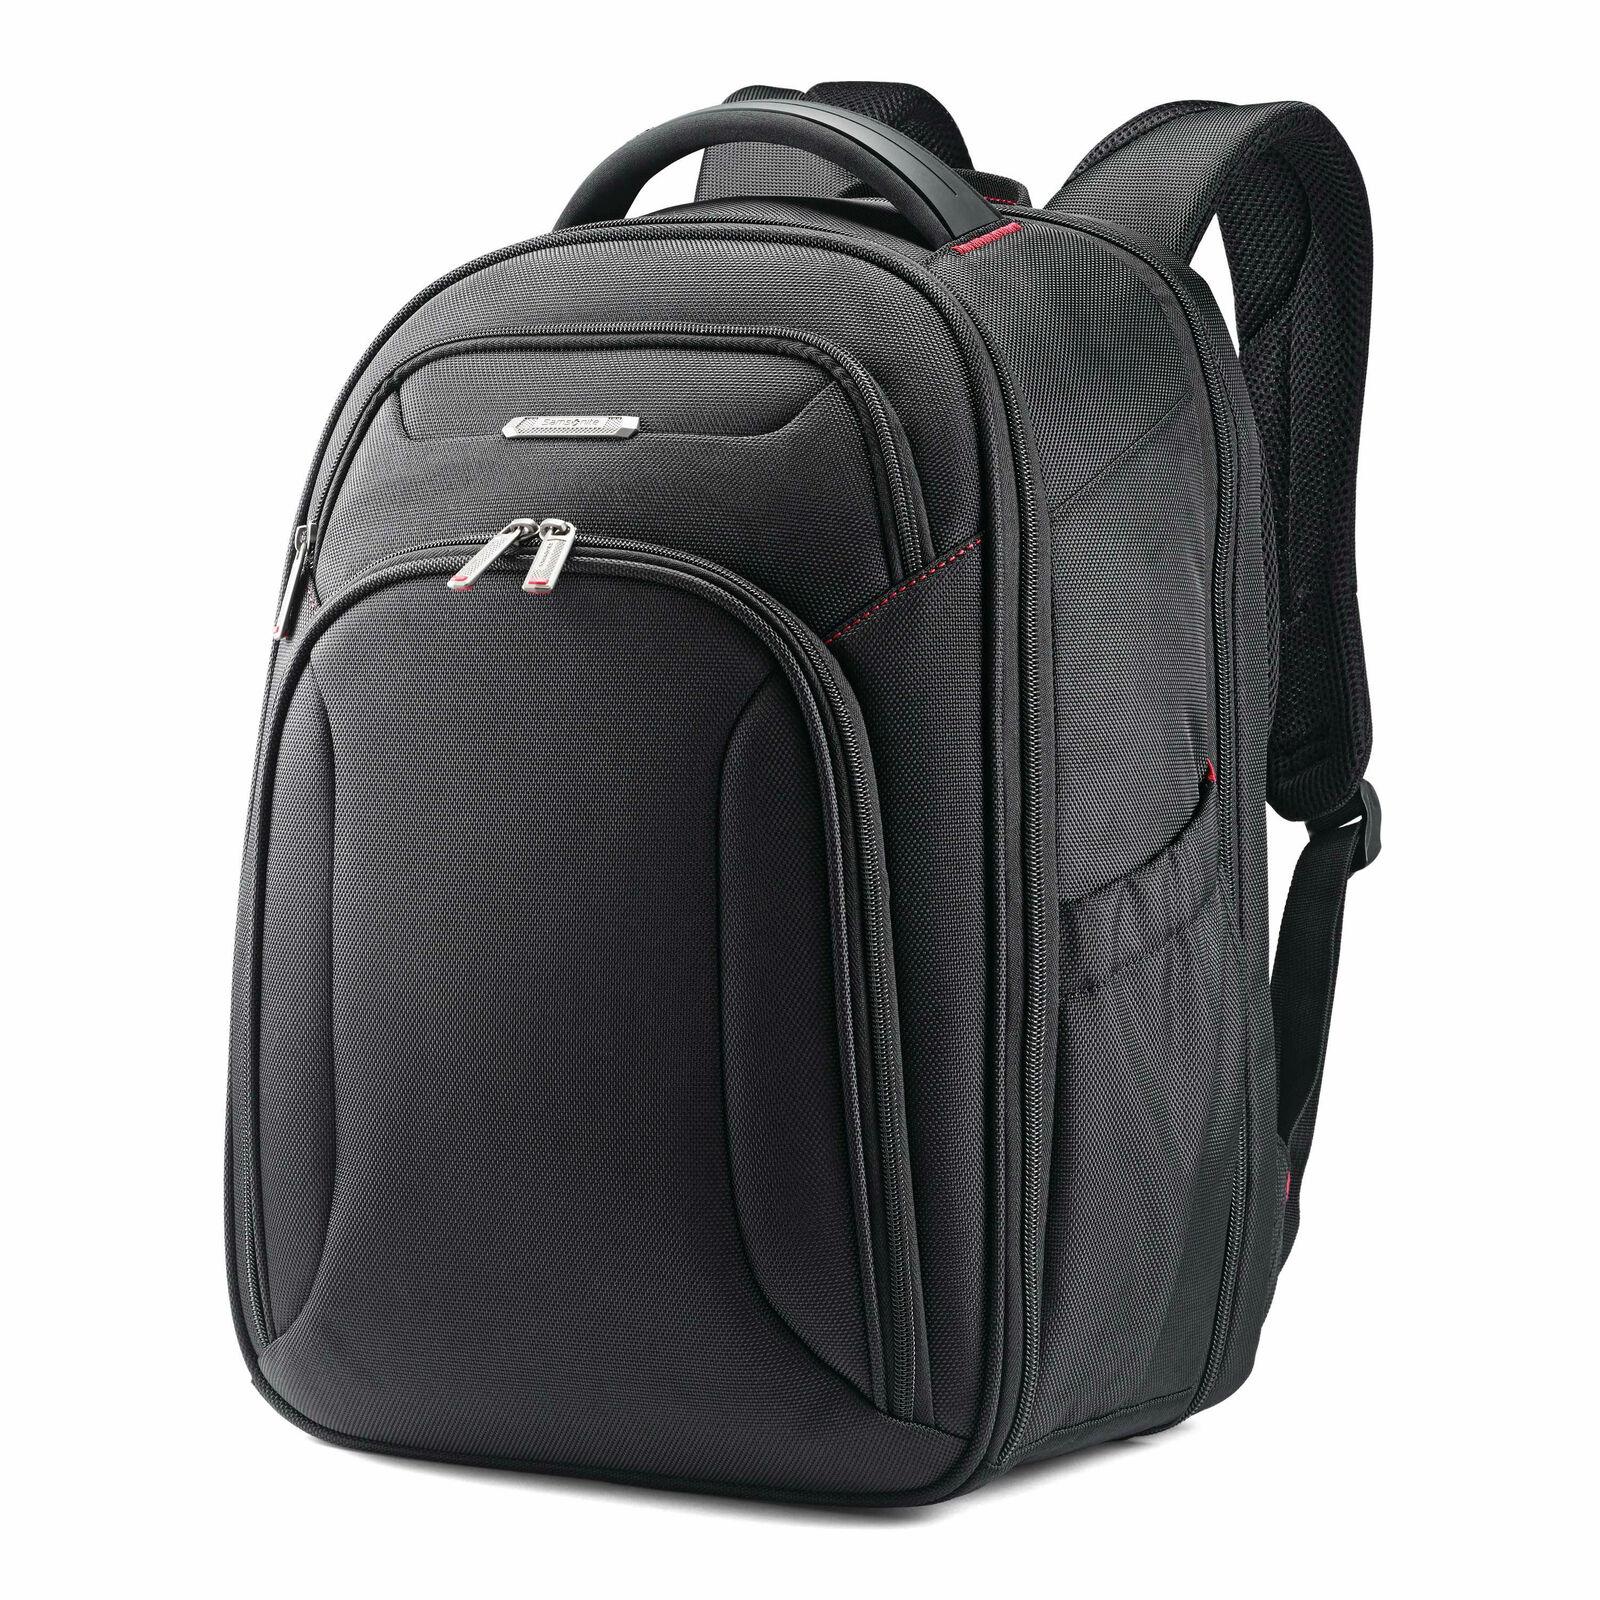 Samsonite Xenon 3.0 Large Bookbag $34+tax Free shipping